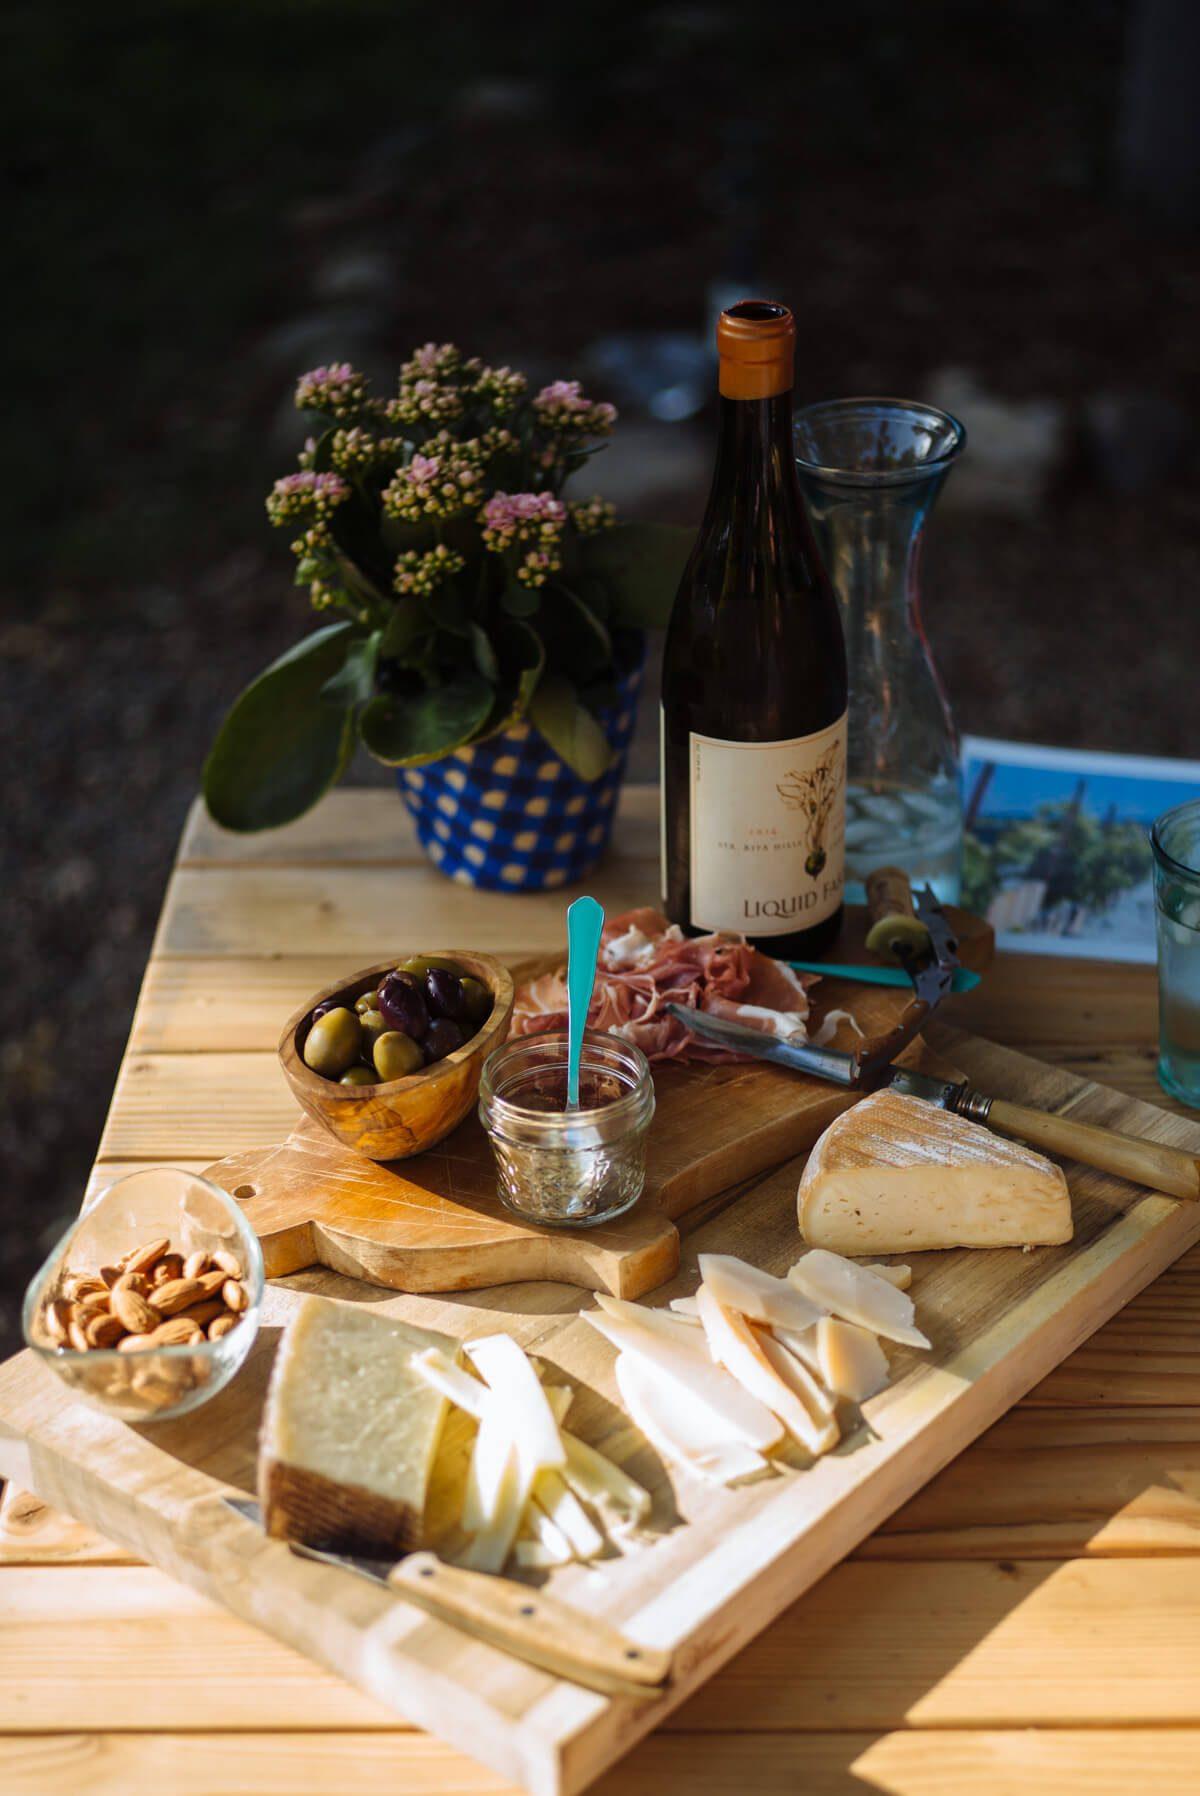 Liquid Farm's Golden Slope wine with charcuterie board - The Taste SF tasting outside in Santa Ynez Valley